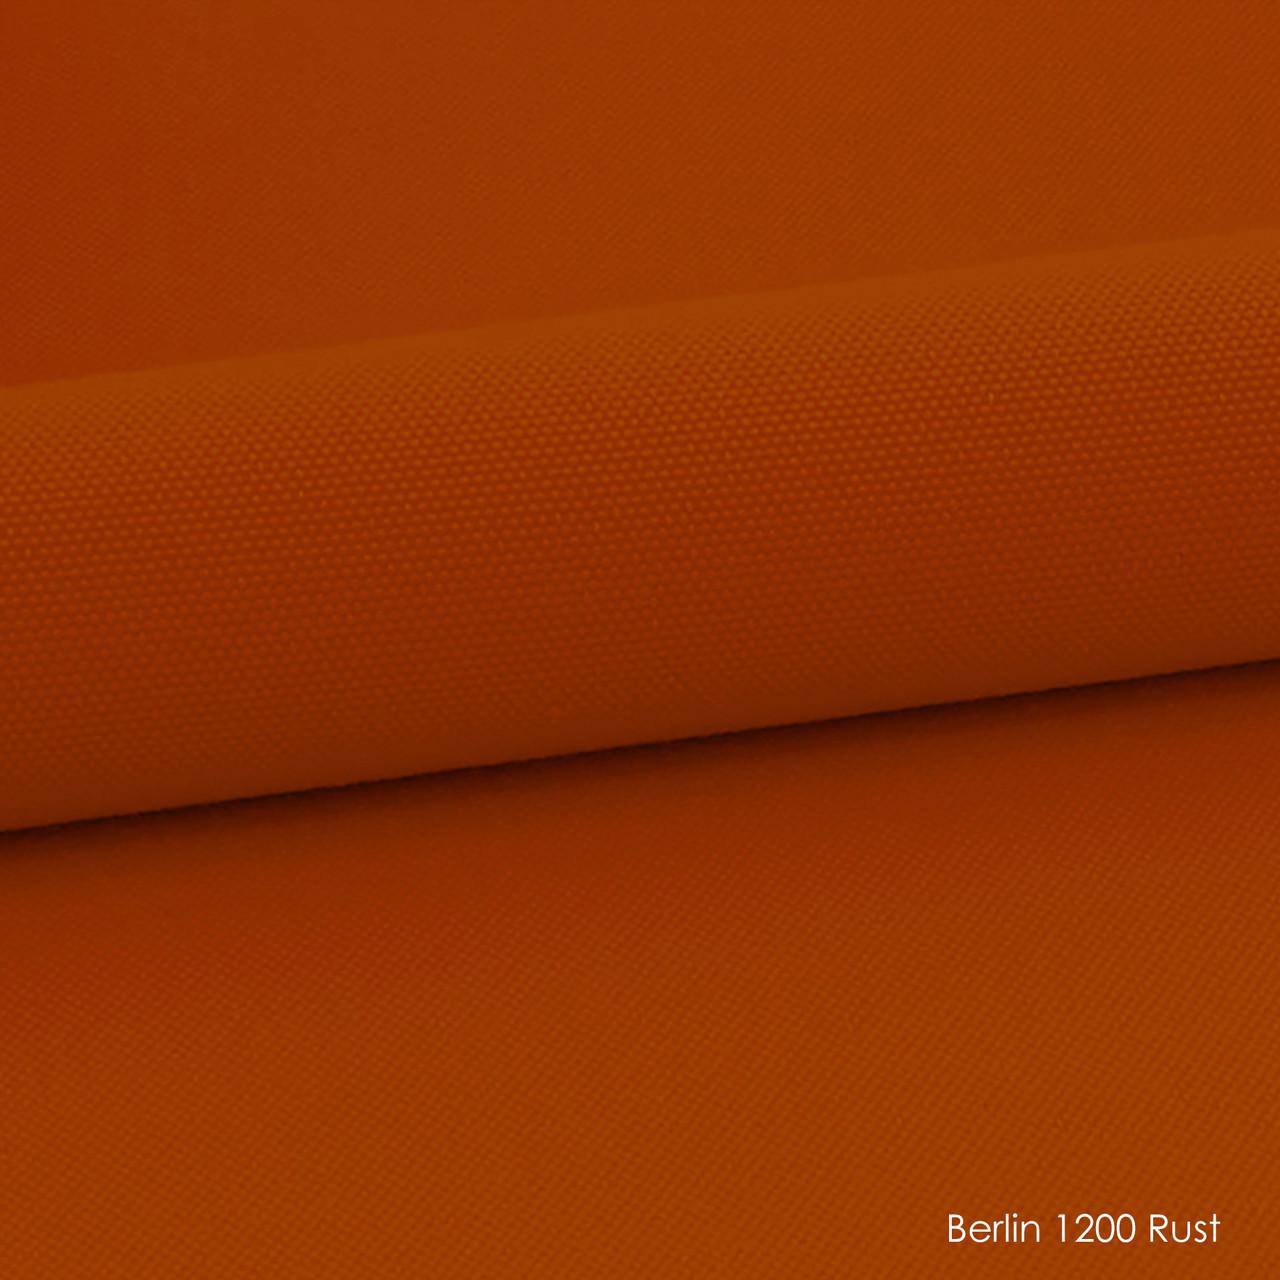 Berlin 1200 rust